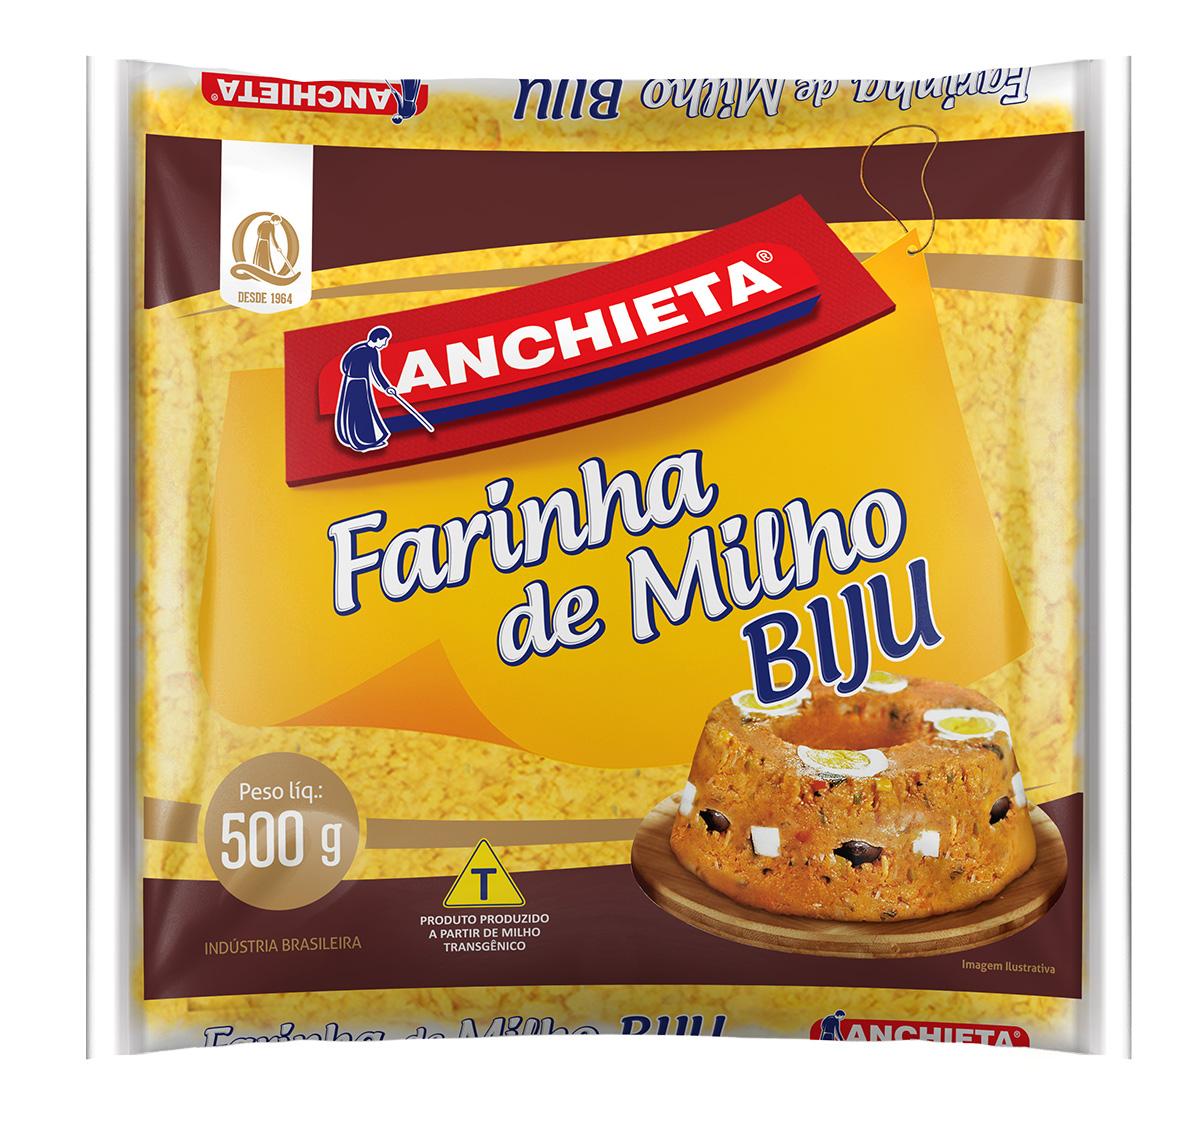 Farinha Milho Integral Farinha de Milho Bijú 1kg